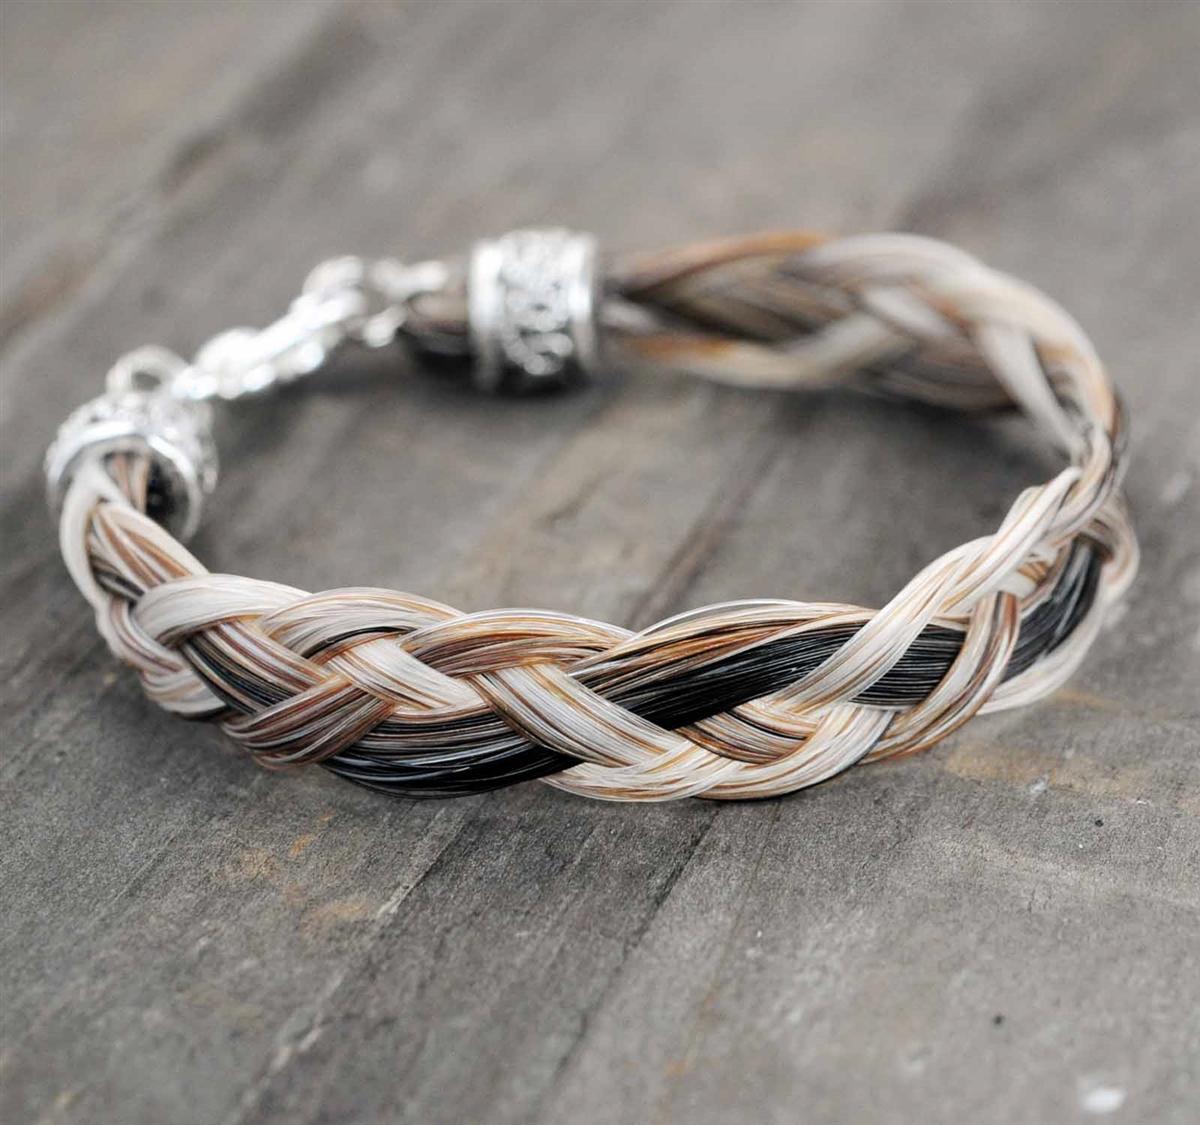 Spirithorse Designs Kael Horse Hair Bracelet Larger Photo Email A Friend